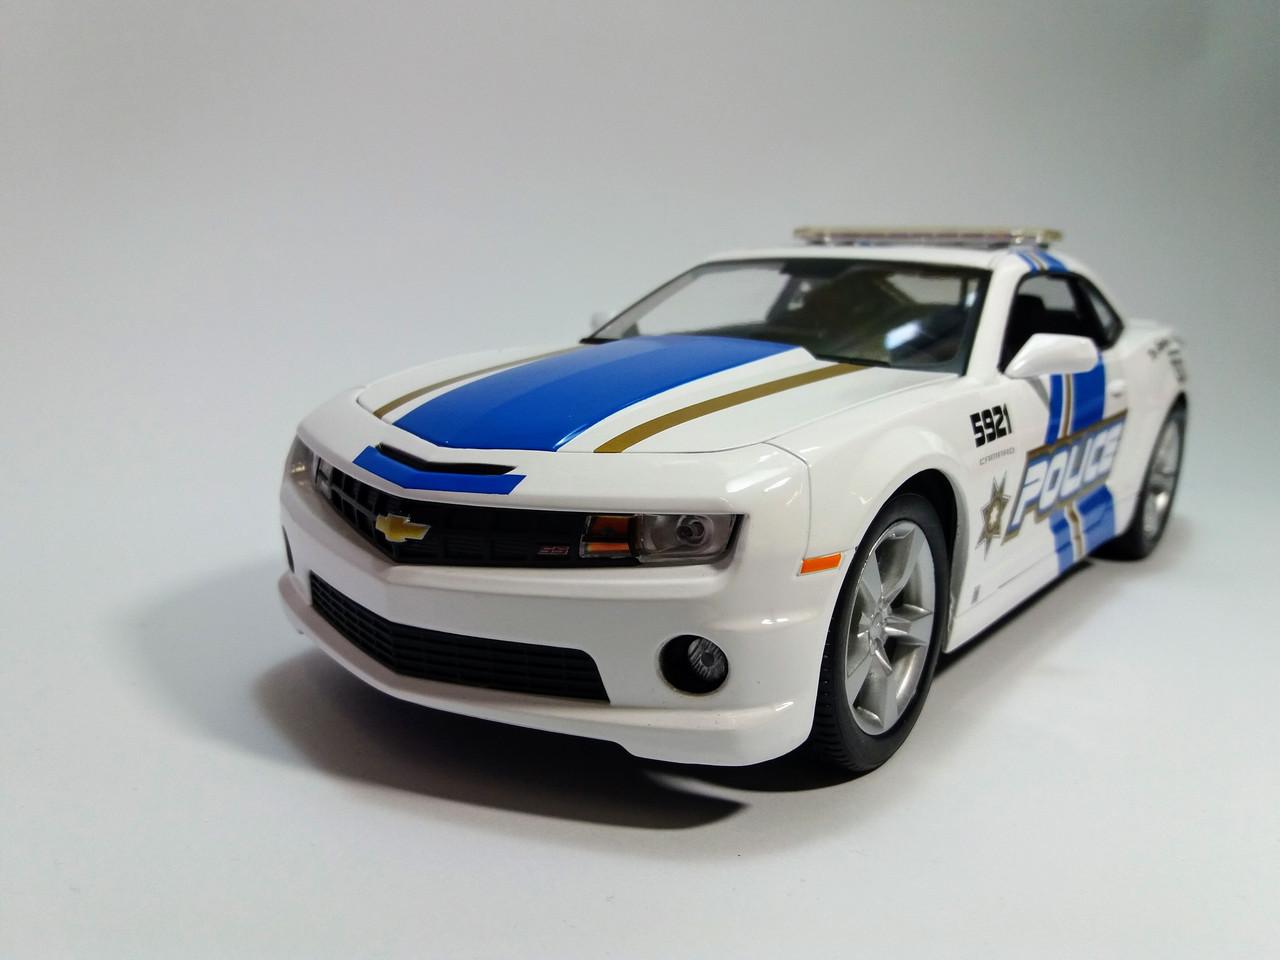 Автомодель (1:18) Chevrolet Camaro SS RS 2010 MAISTO 31161  белый